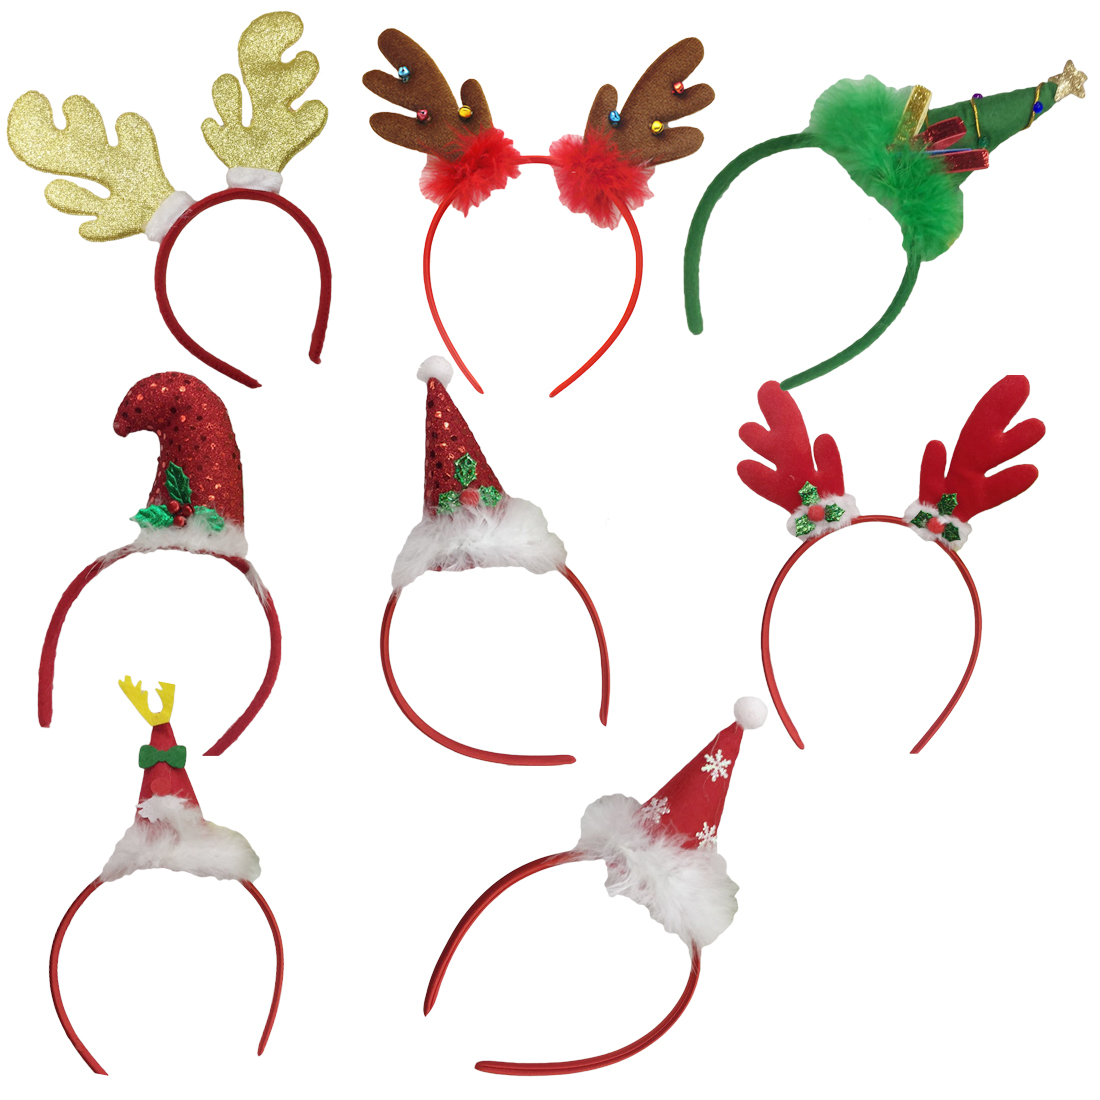 Cute New Hot Christmas Headband Party Decor Double Hair Band Clasp Head Hoop christmas hair accessories Women in Women 39 s Hair Accessories from Apparel Accessories